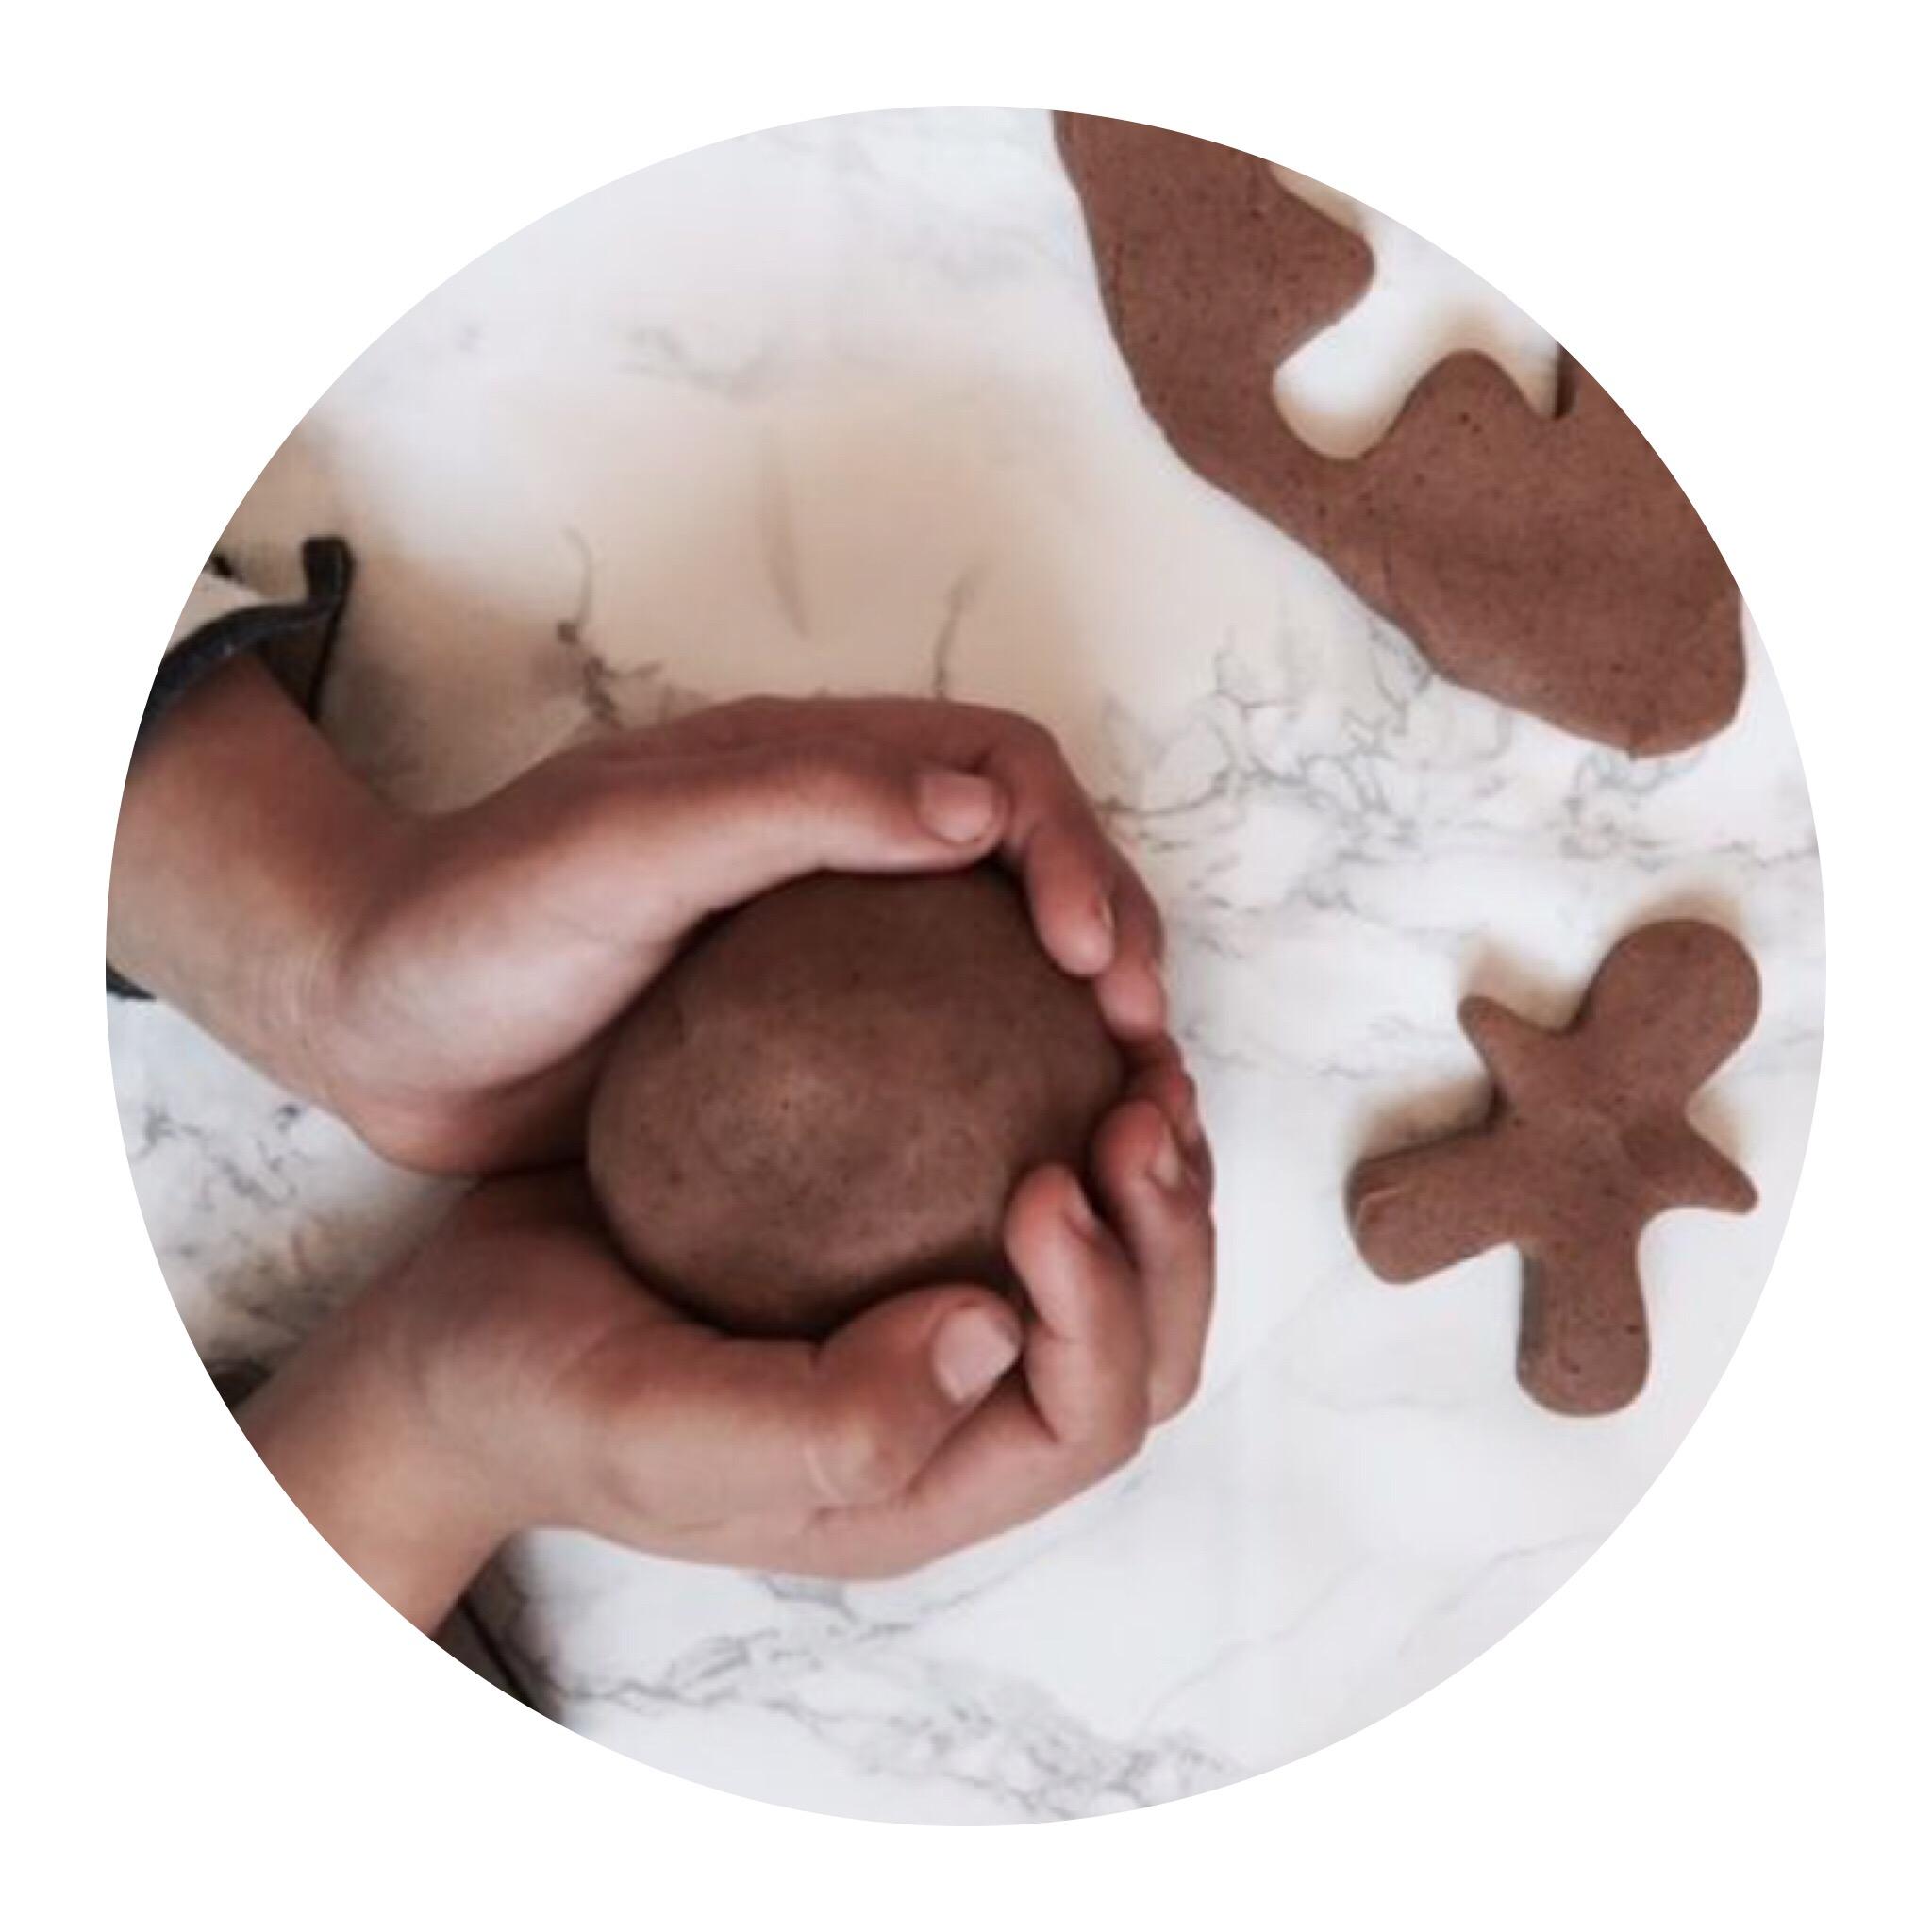 http://modernmotherblog.com/blog/2015/2/5/diy-gingerbread-play-dough